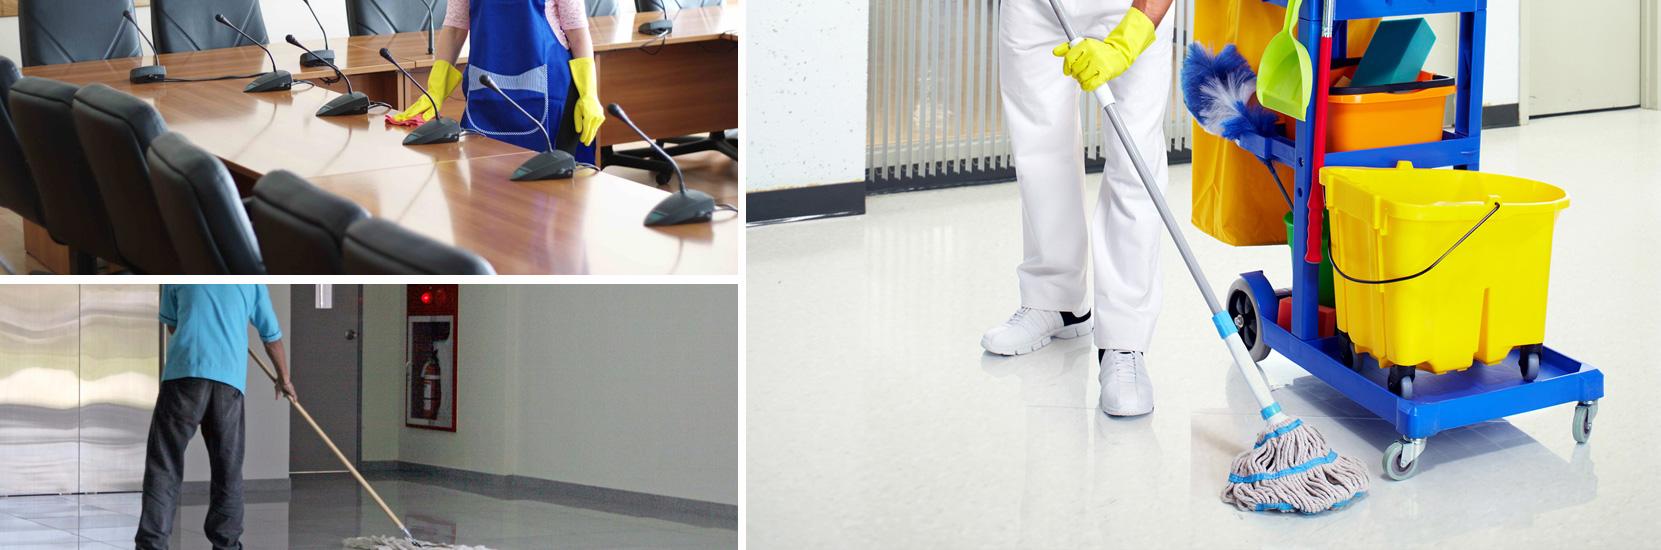 Empresas de limpieza mallorca stunning ambiseint balears limpieza de servicios a empresas en - Empresas limpieza mallorca ...